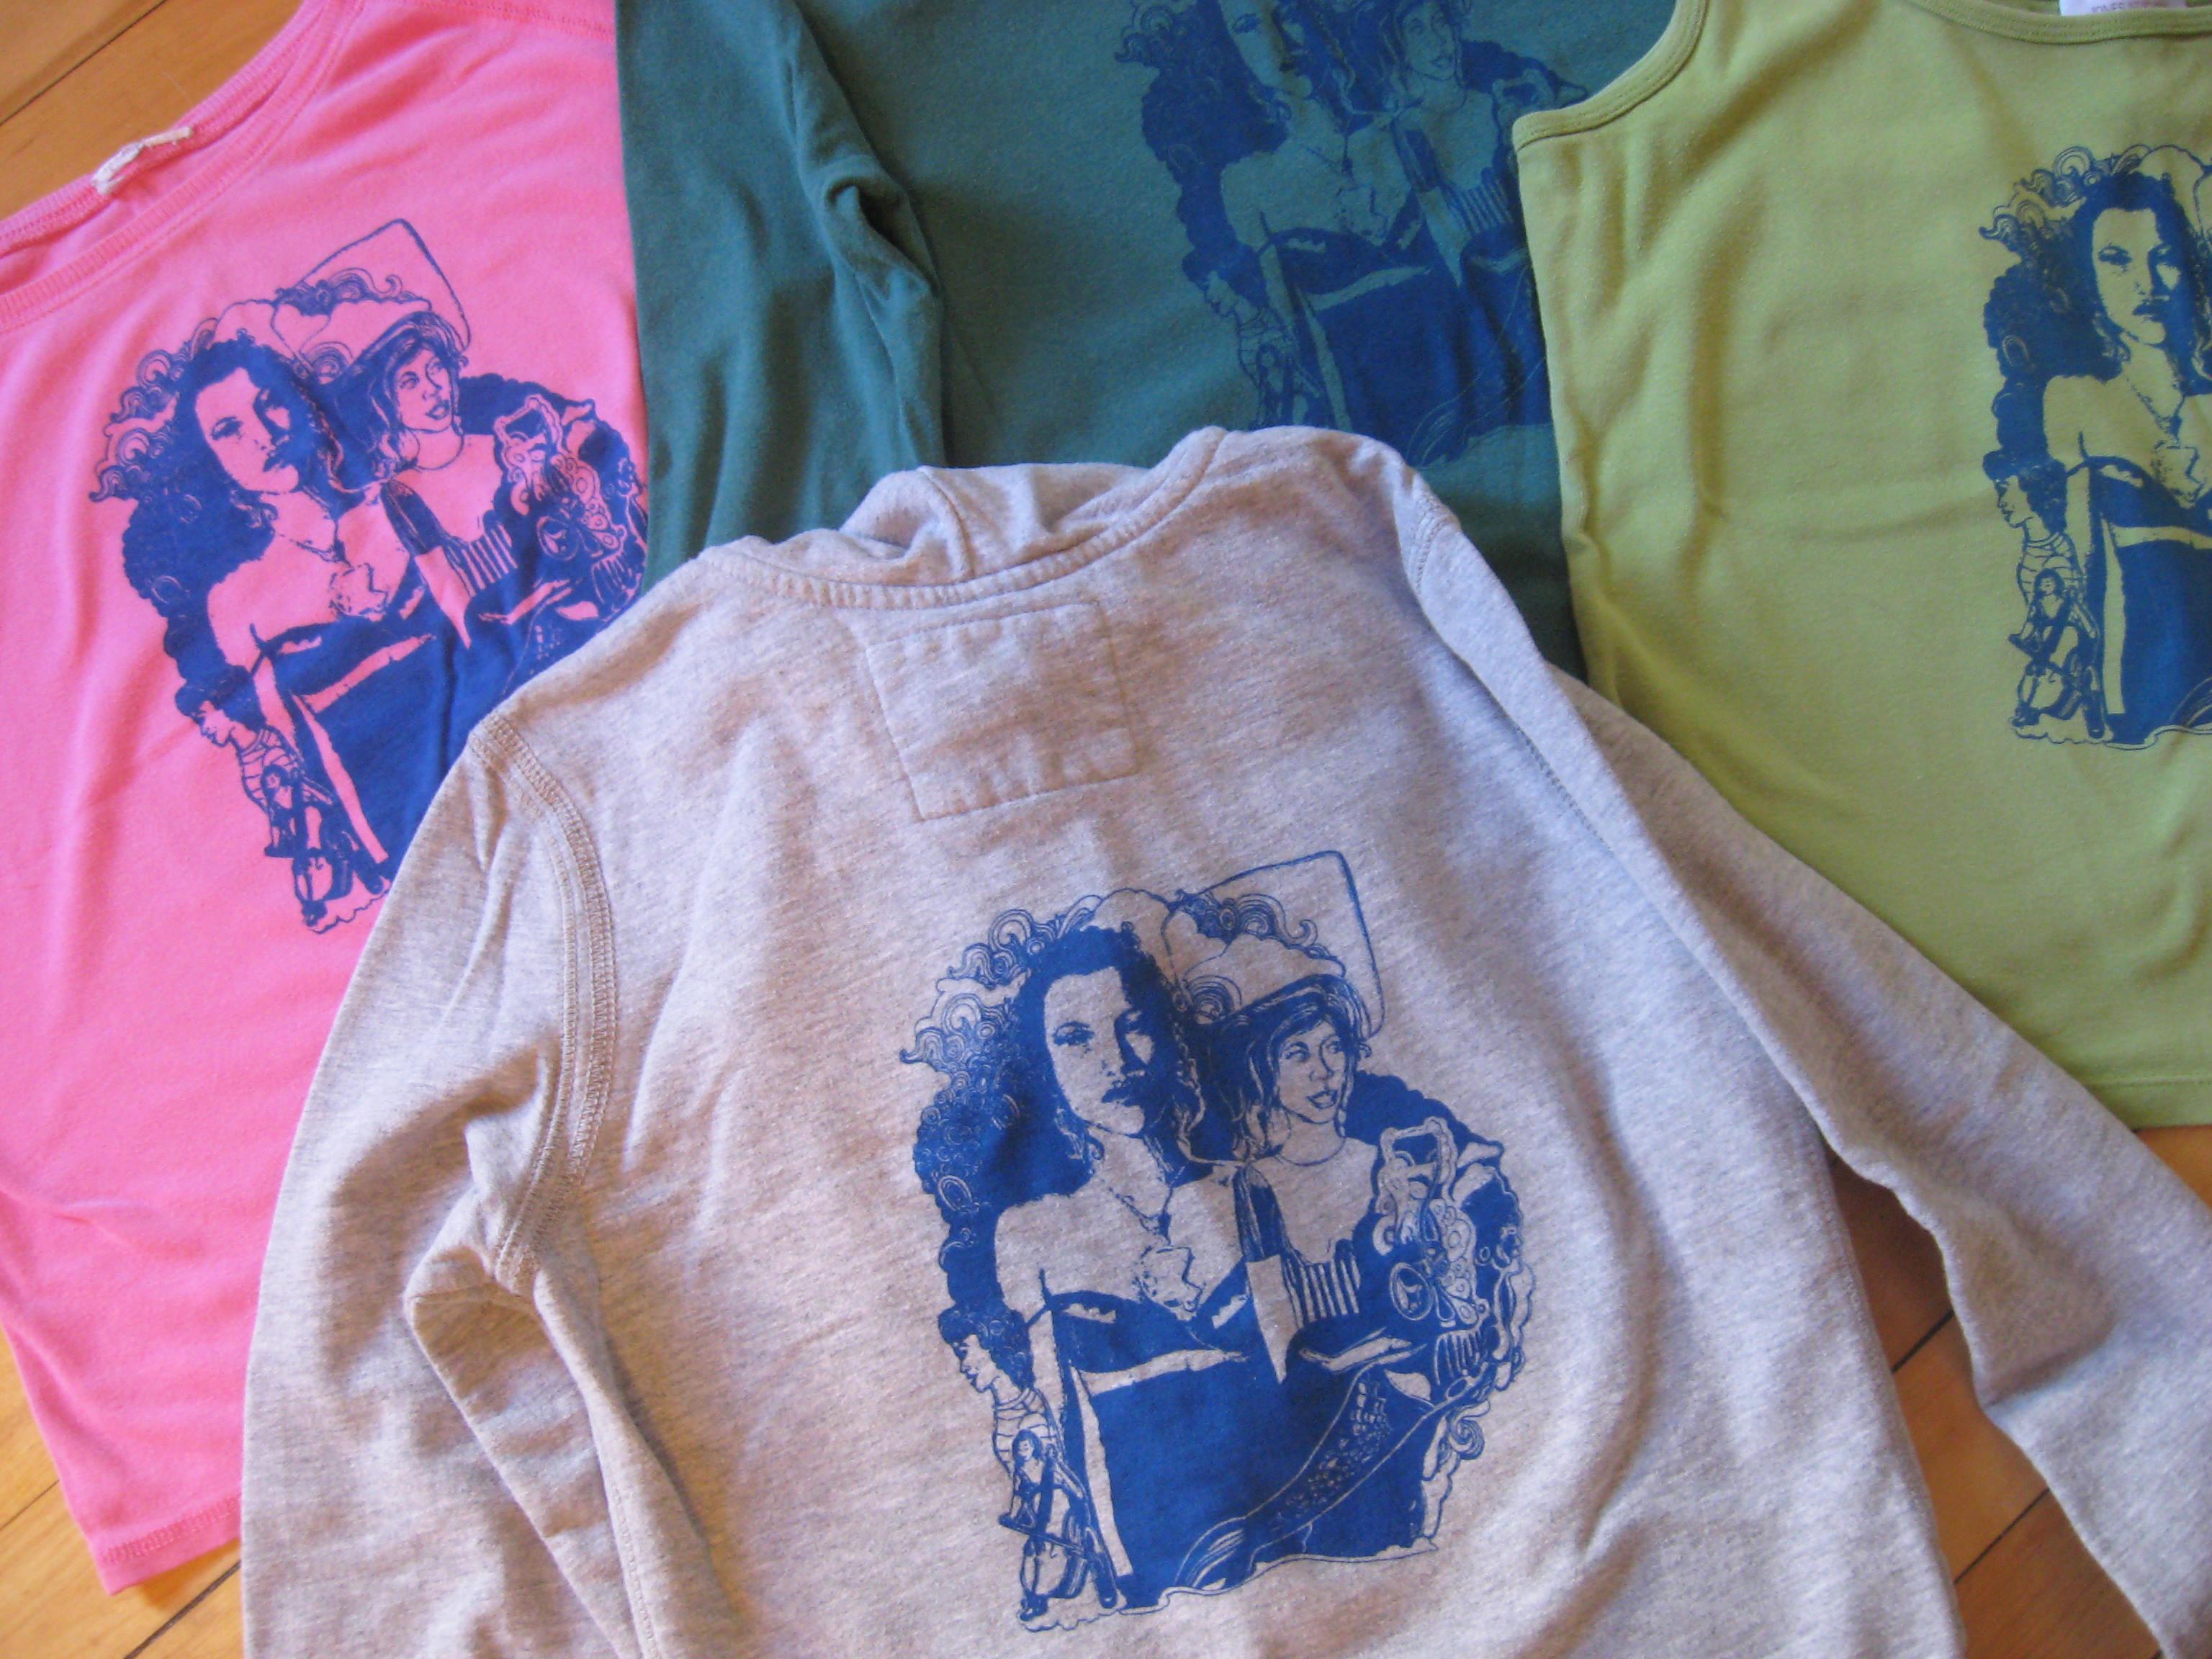 Girls Original T Shirt Design Printed On A Range Of Shirts Eva